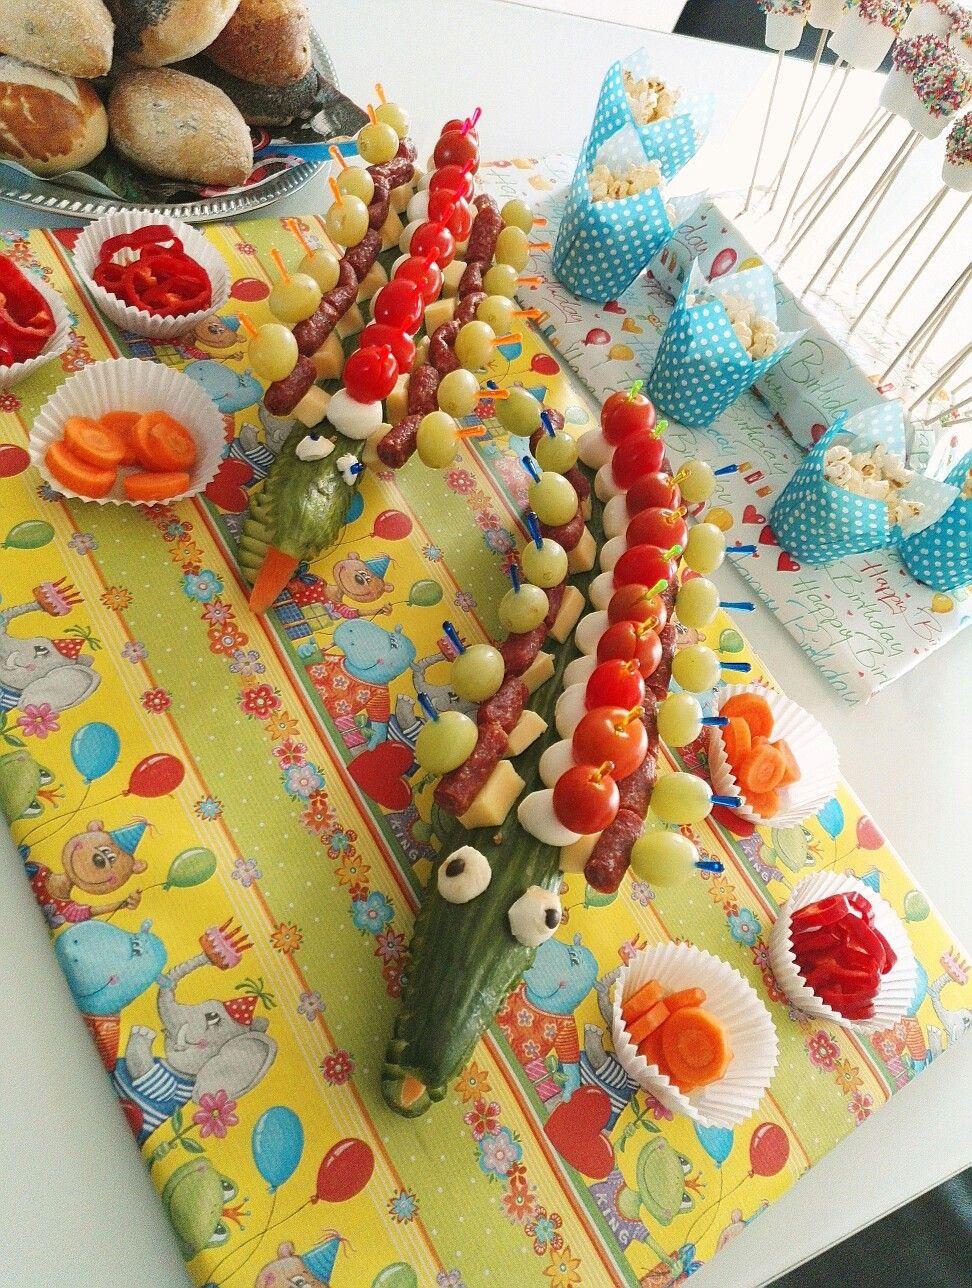 kindergarten jause f r den kindergeburtstag krokodil eigene pinterest kindergarten and snacks. Black Bedroom Furniture Sets. Home Design Ideas